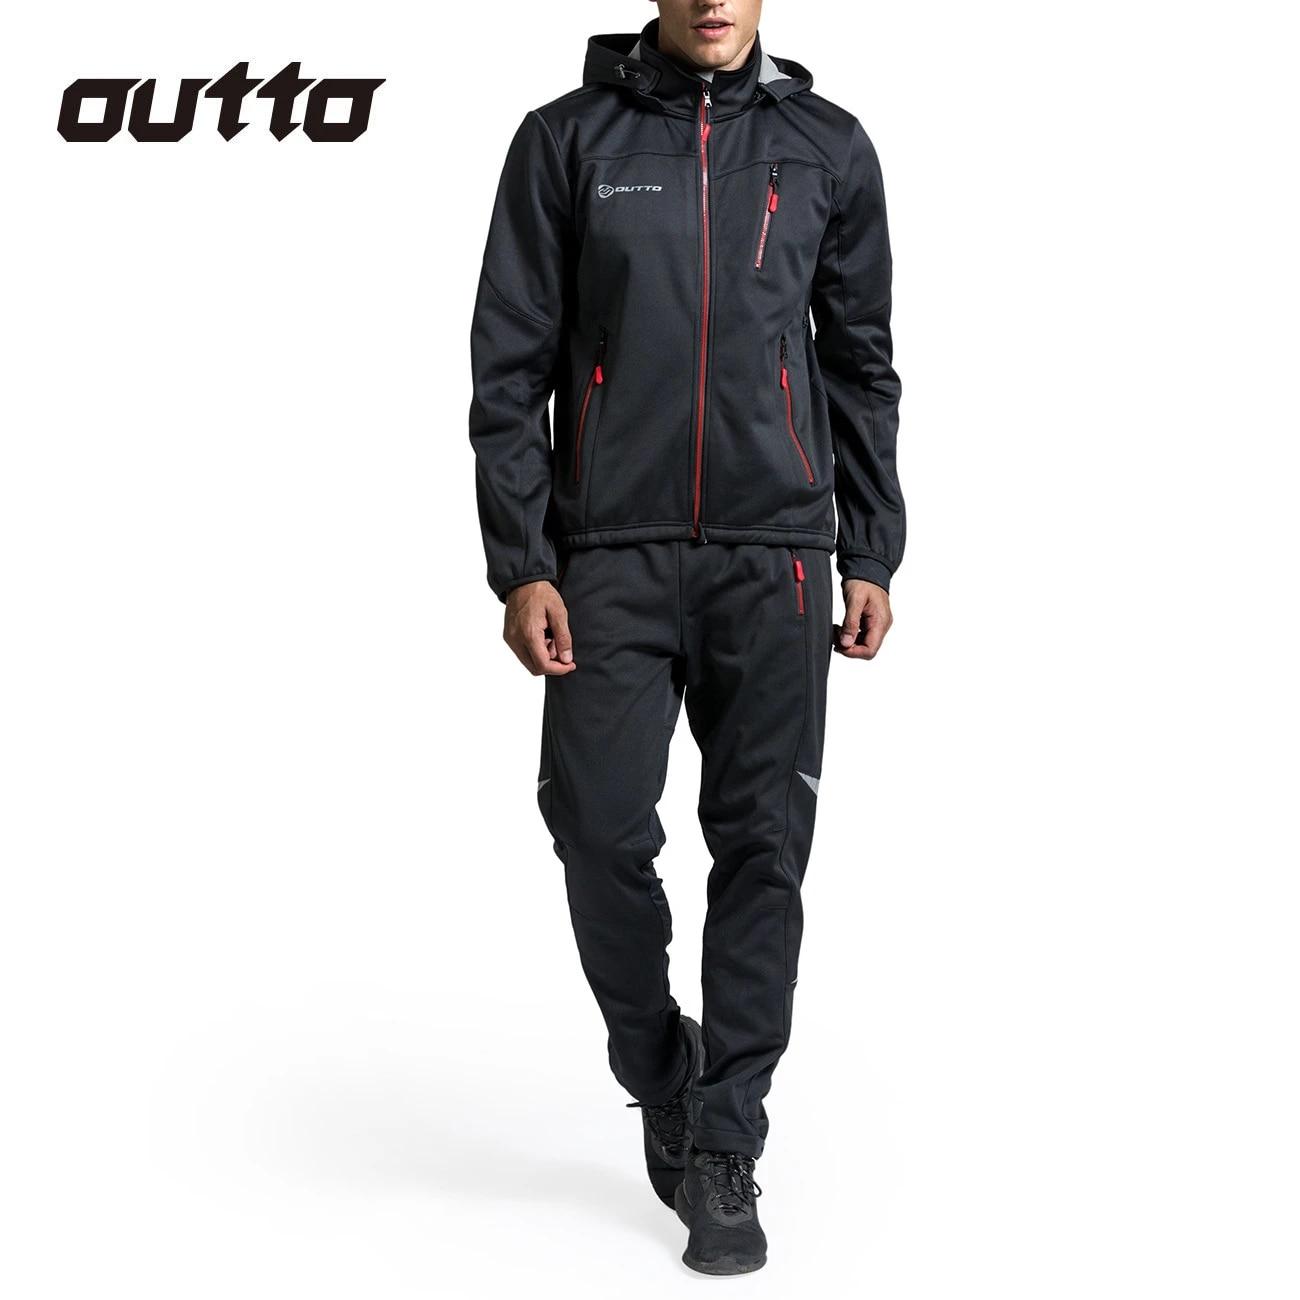 Thermal Fleece Warm Cycling Jacket /& Pants Suit Winter Bike Windproof Clothing